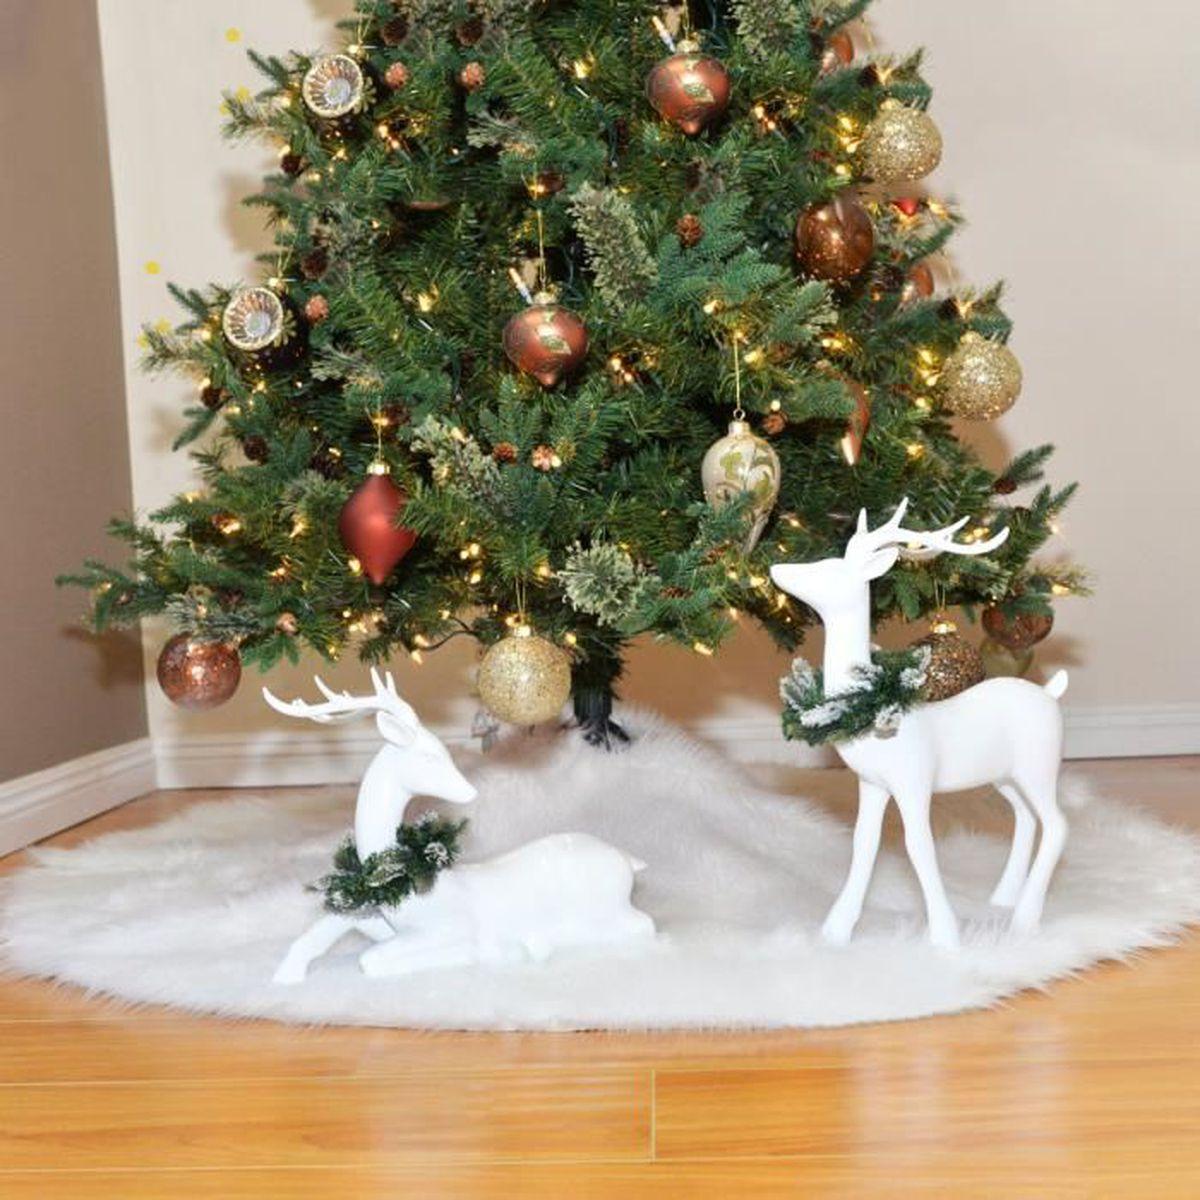 Deco Pied De Sapin tapis de sapin arbre de noël tinksky 78cm arbre de noël jupe